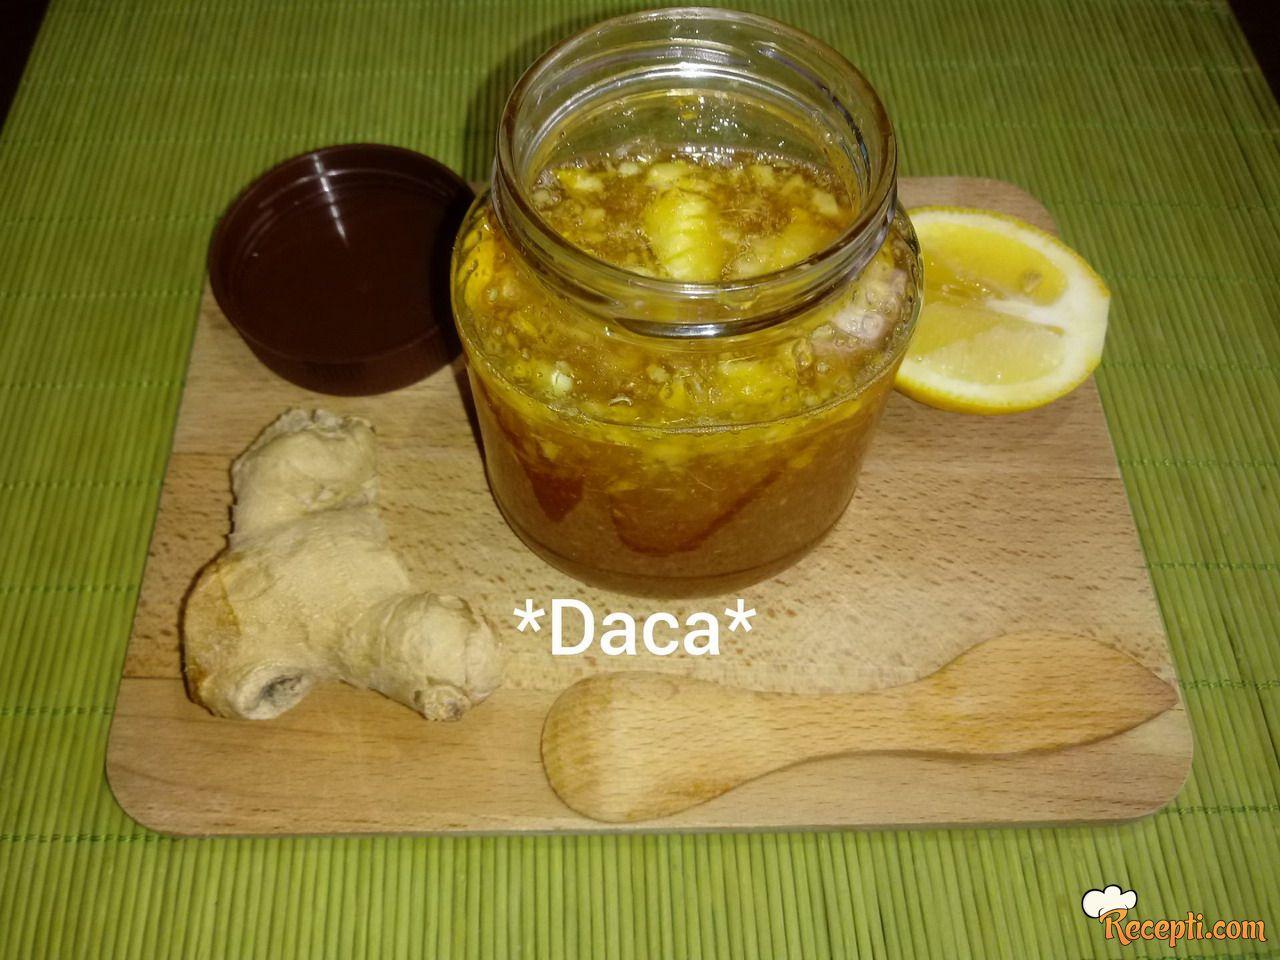 Vitaminska bomba od meda,djumbira i limuna